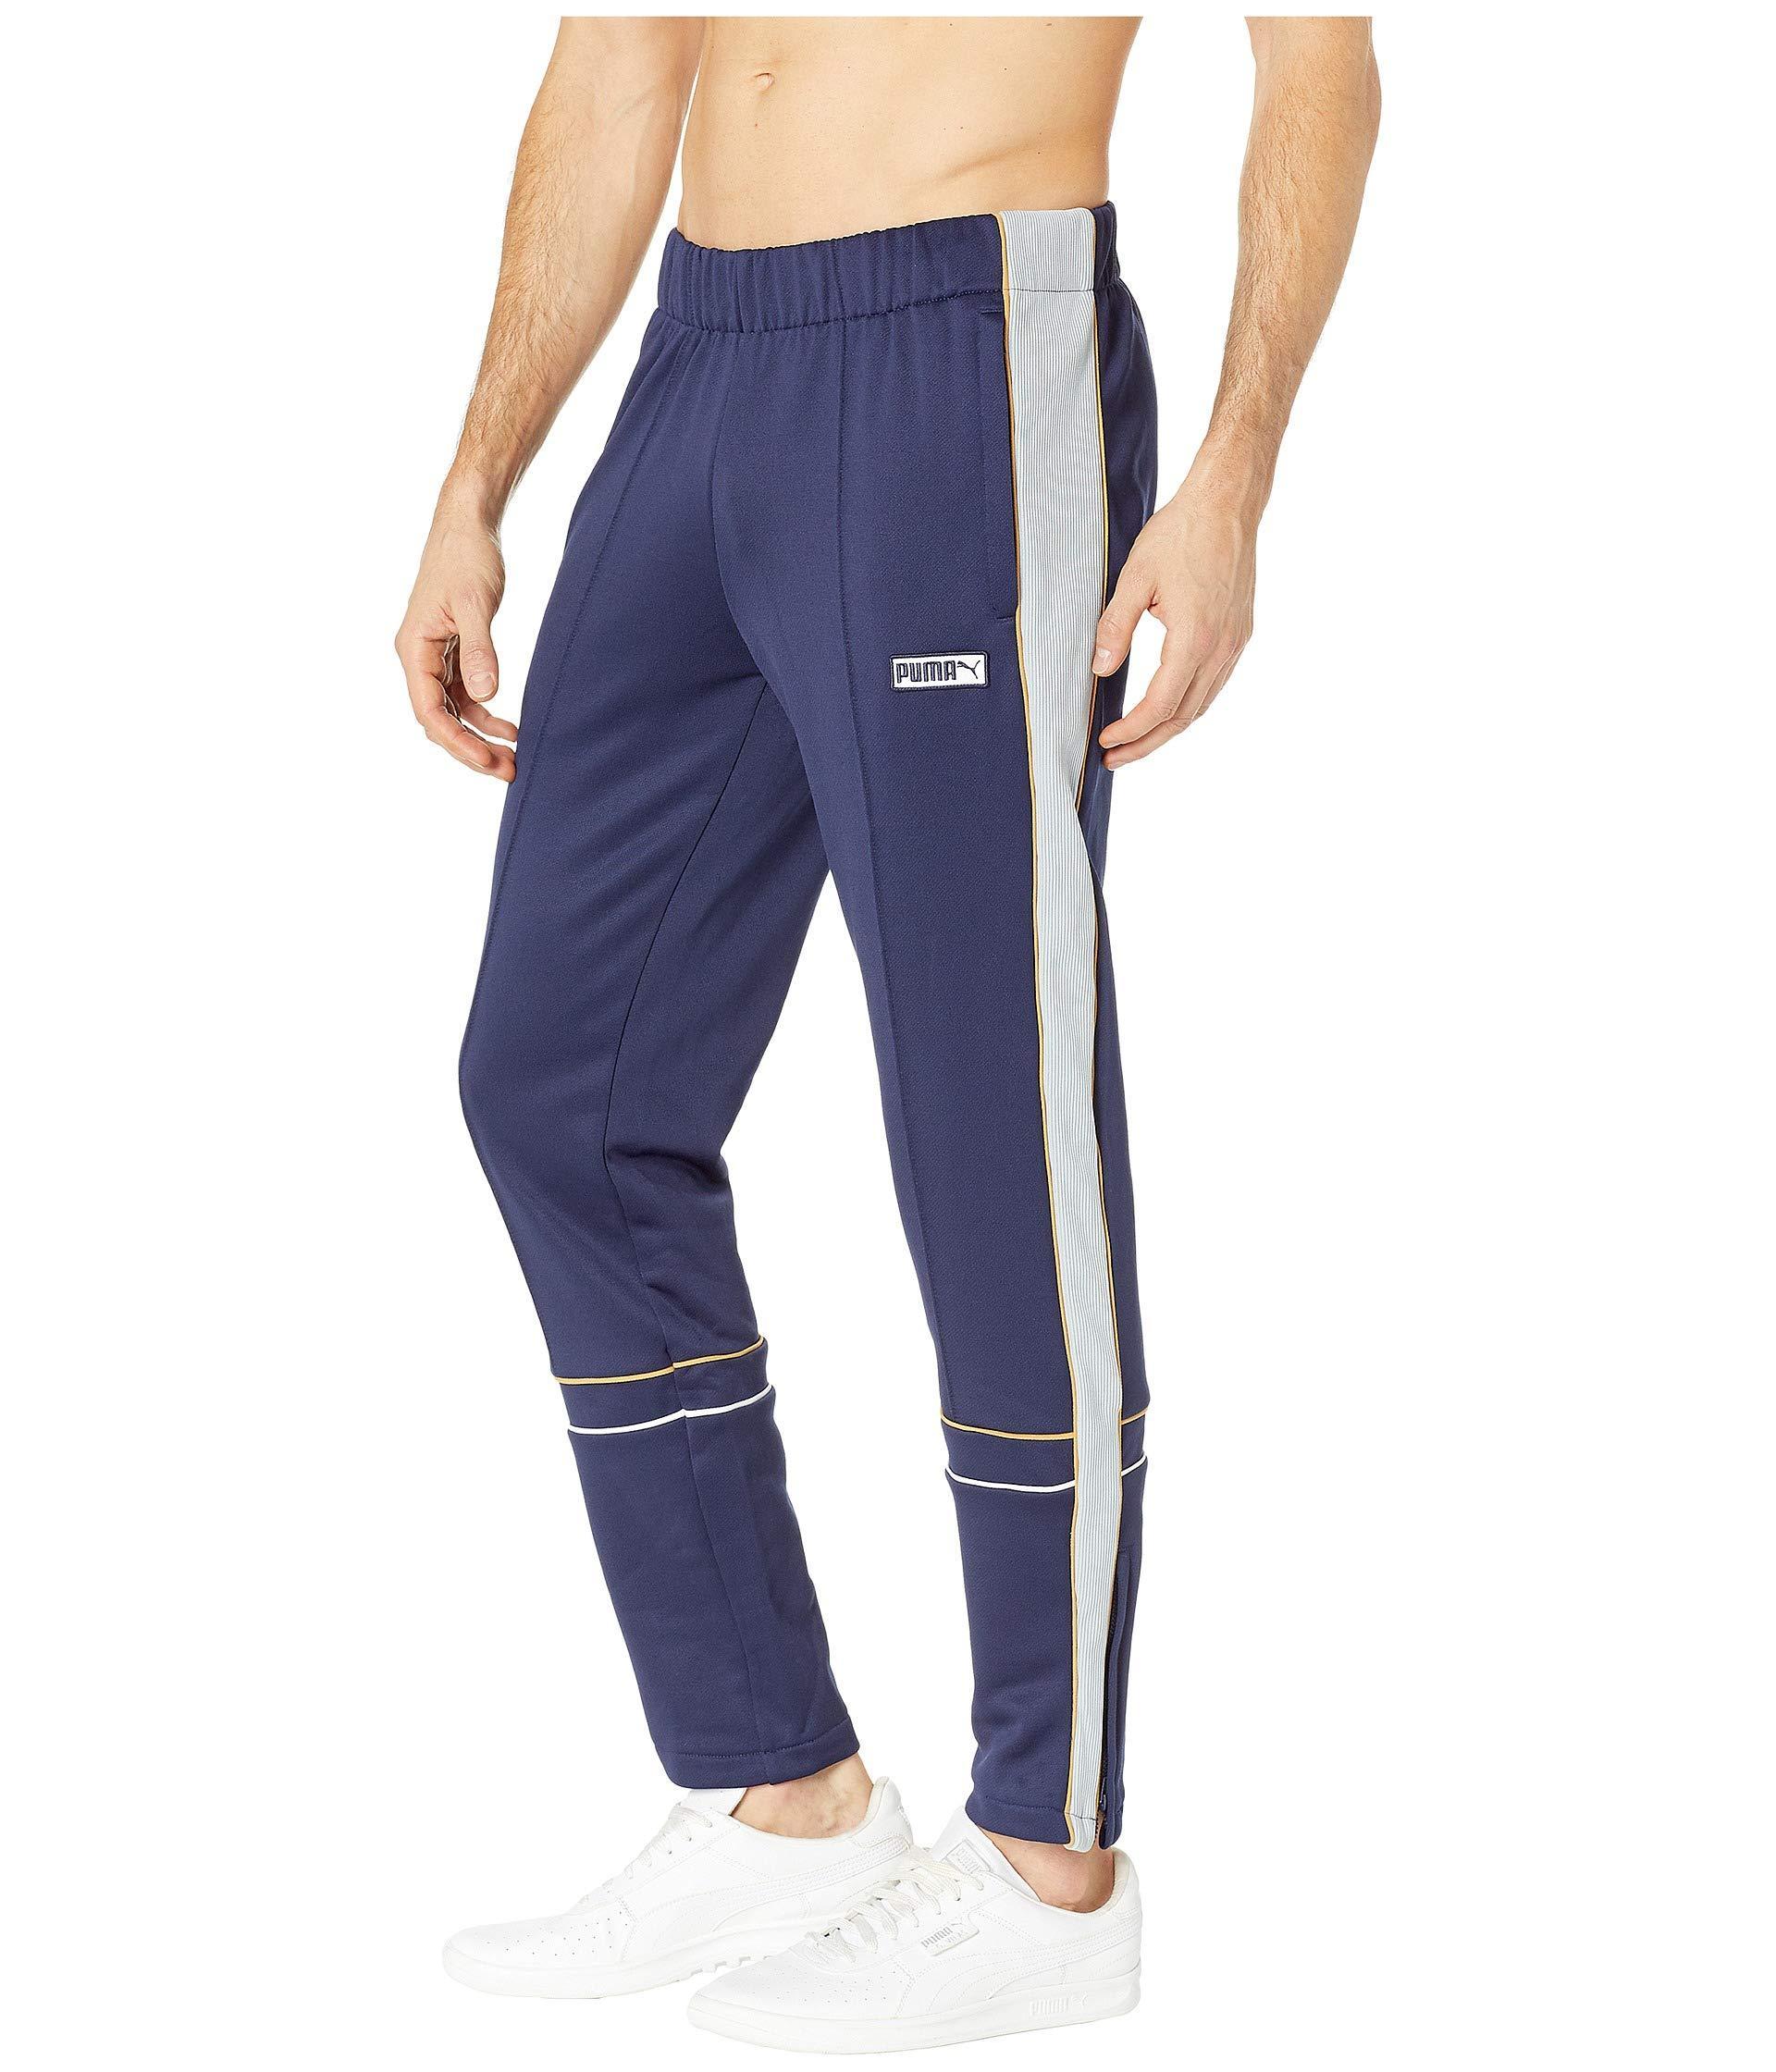 dc169cc1bc69 Lyst - PUMA Lux Spezial Track Pants in Blue for Men